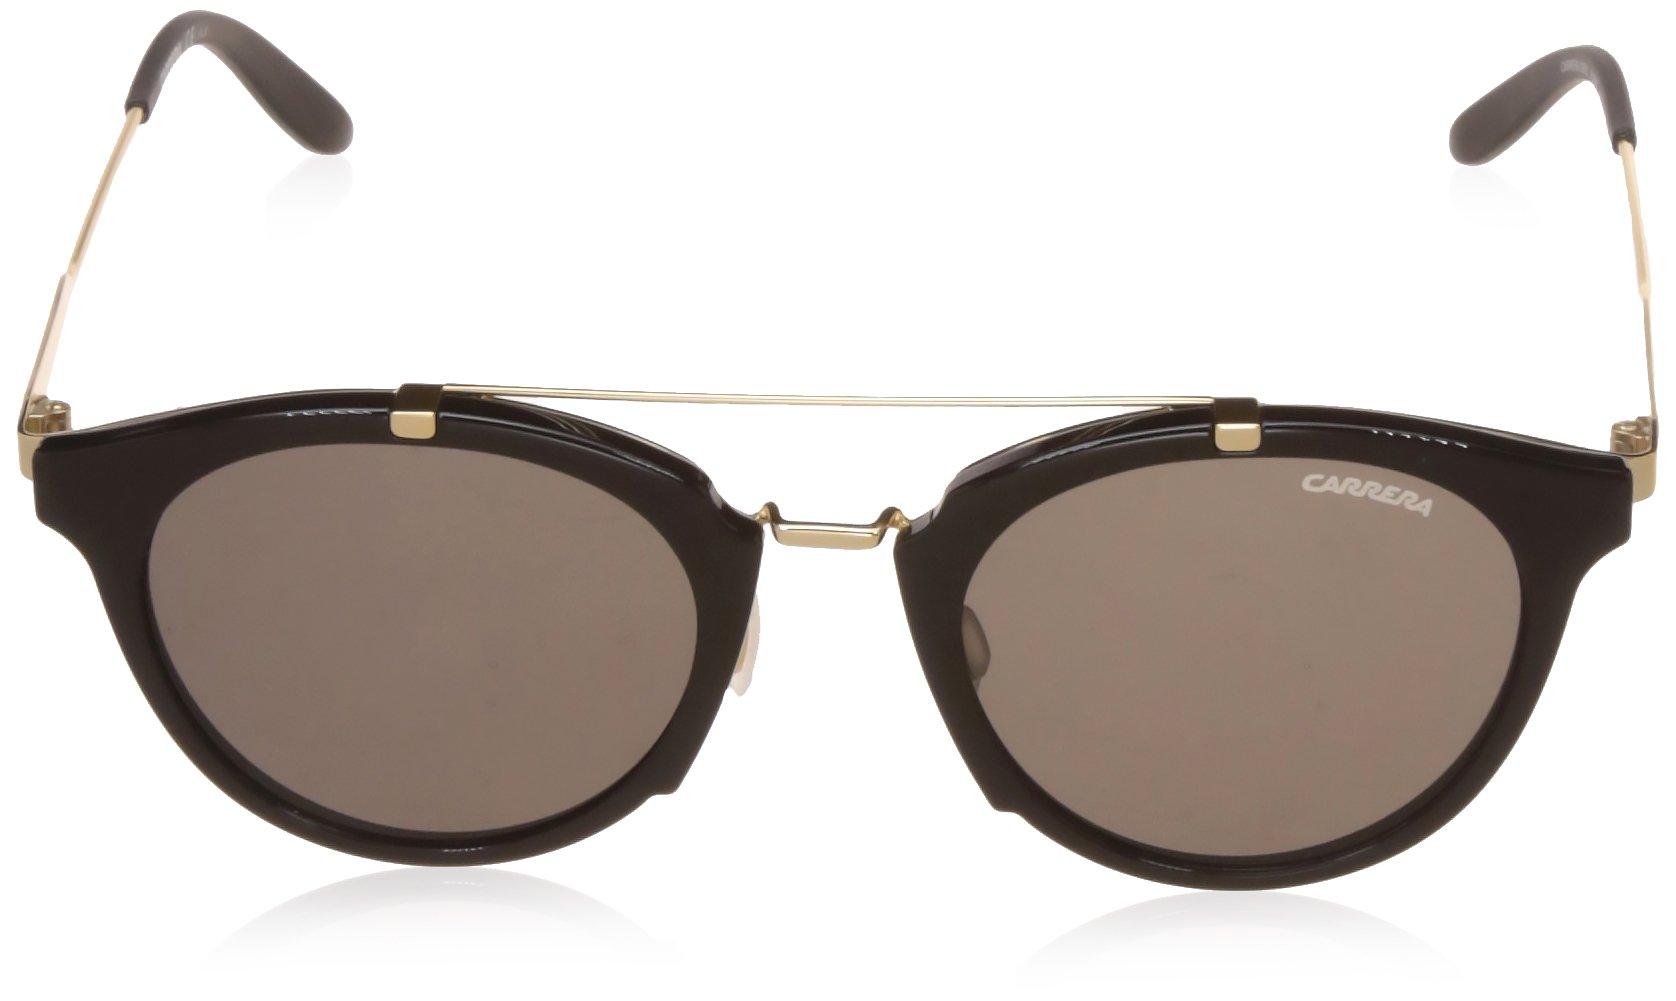 Carrera 126/S NR 6UB Gafas de sol, Negro (Shn Black Gd/Brw Grey), 49 Unisex-Adulto